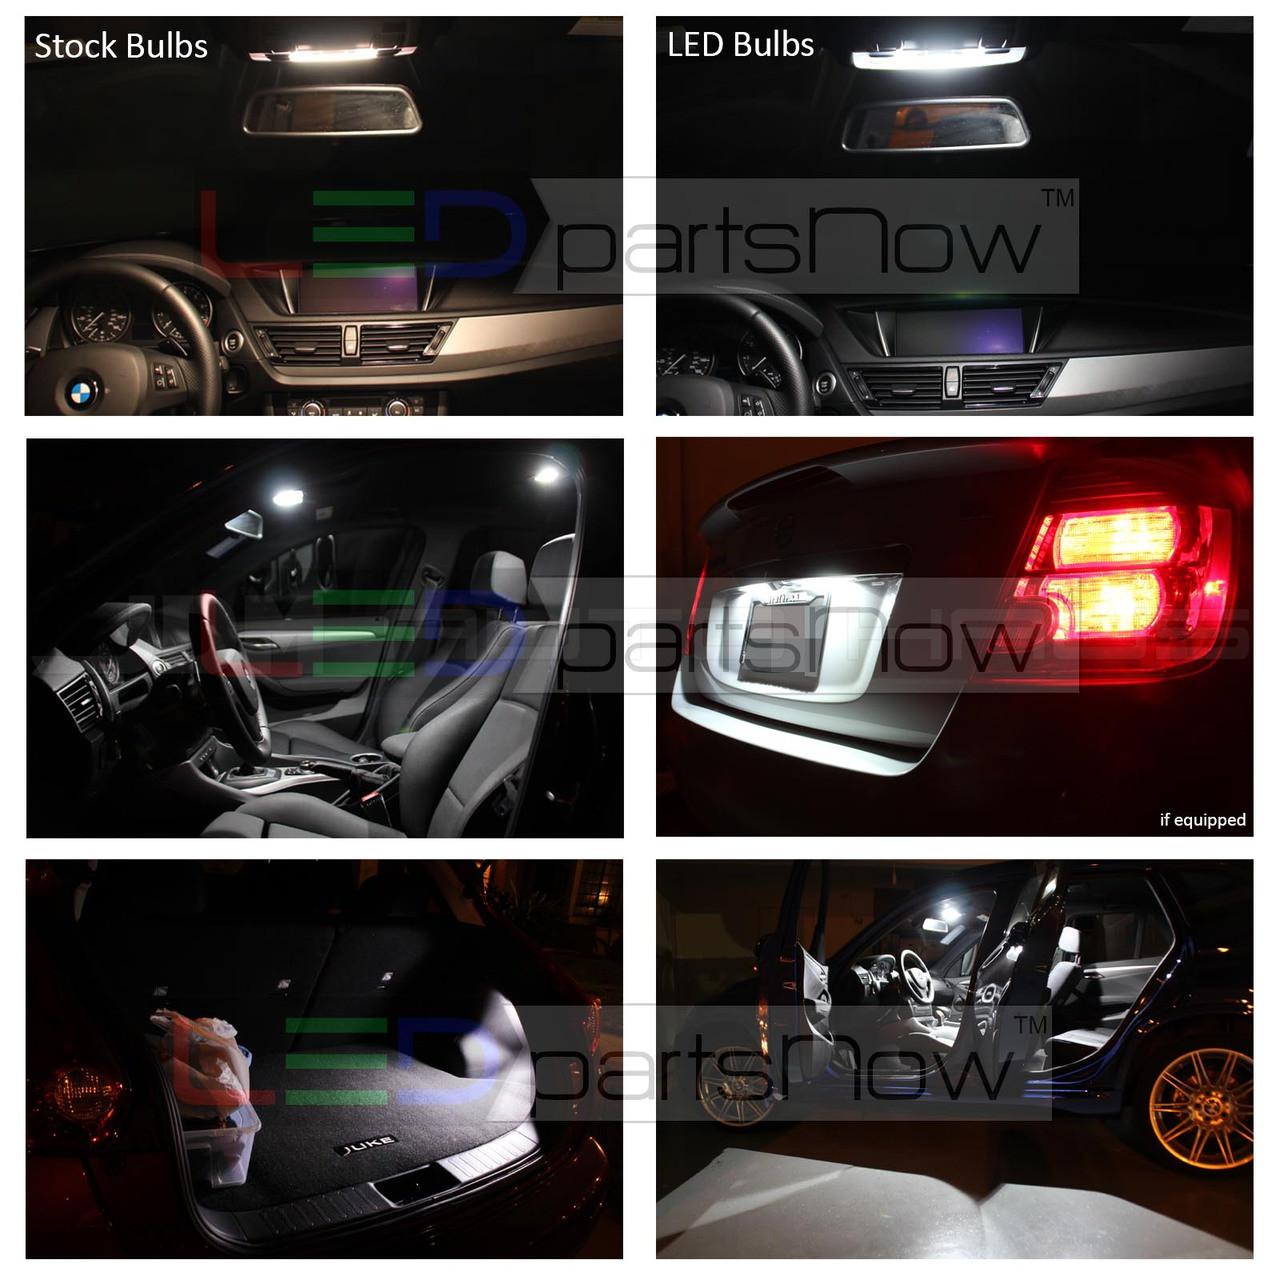 Green Interior LED Lights Package Kit for 2011-2016 Dodge Charger